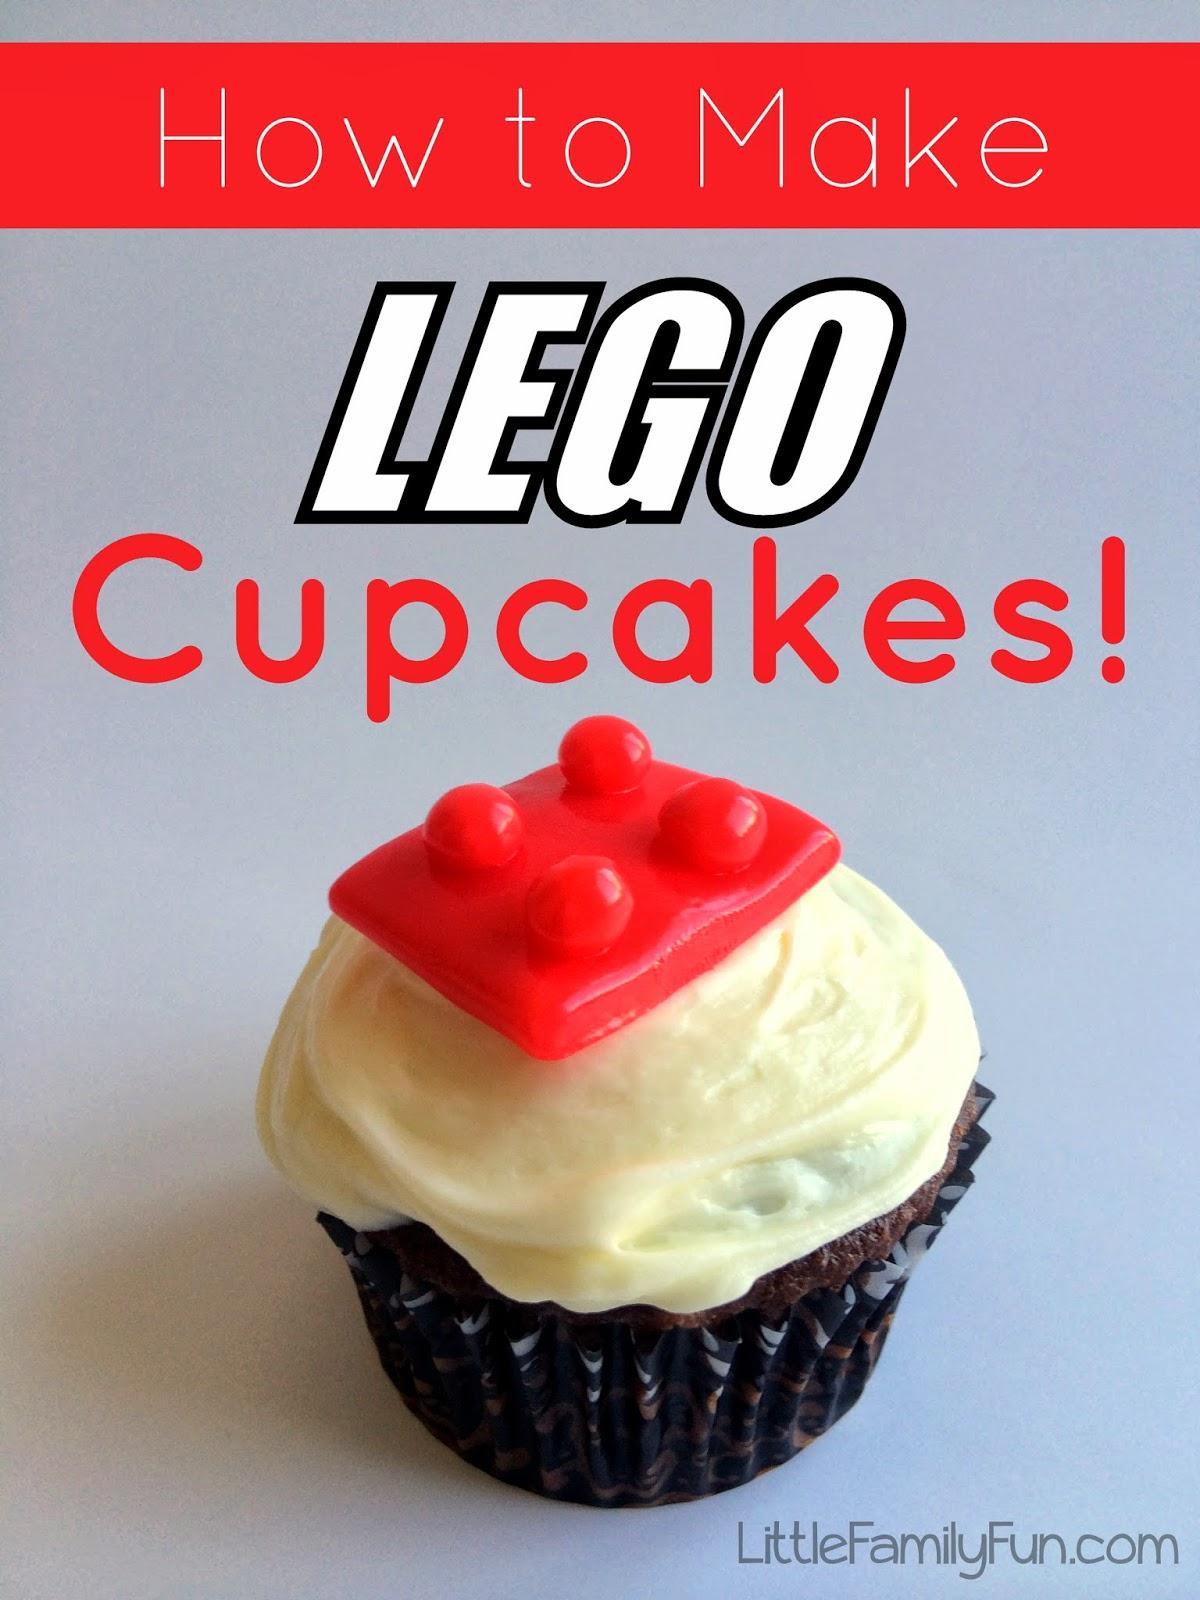 http://www.littlefamilyfun.com/2014/03/how-to-make-lego-cupcakes.html